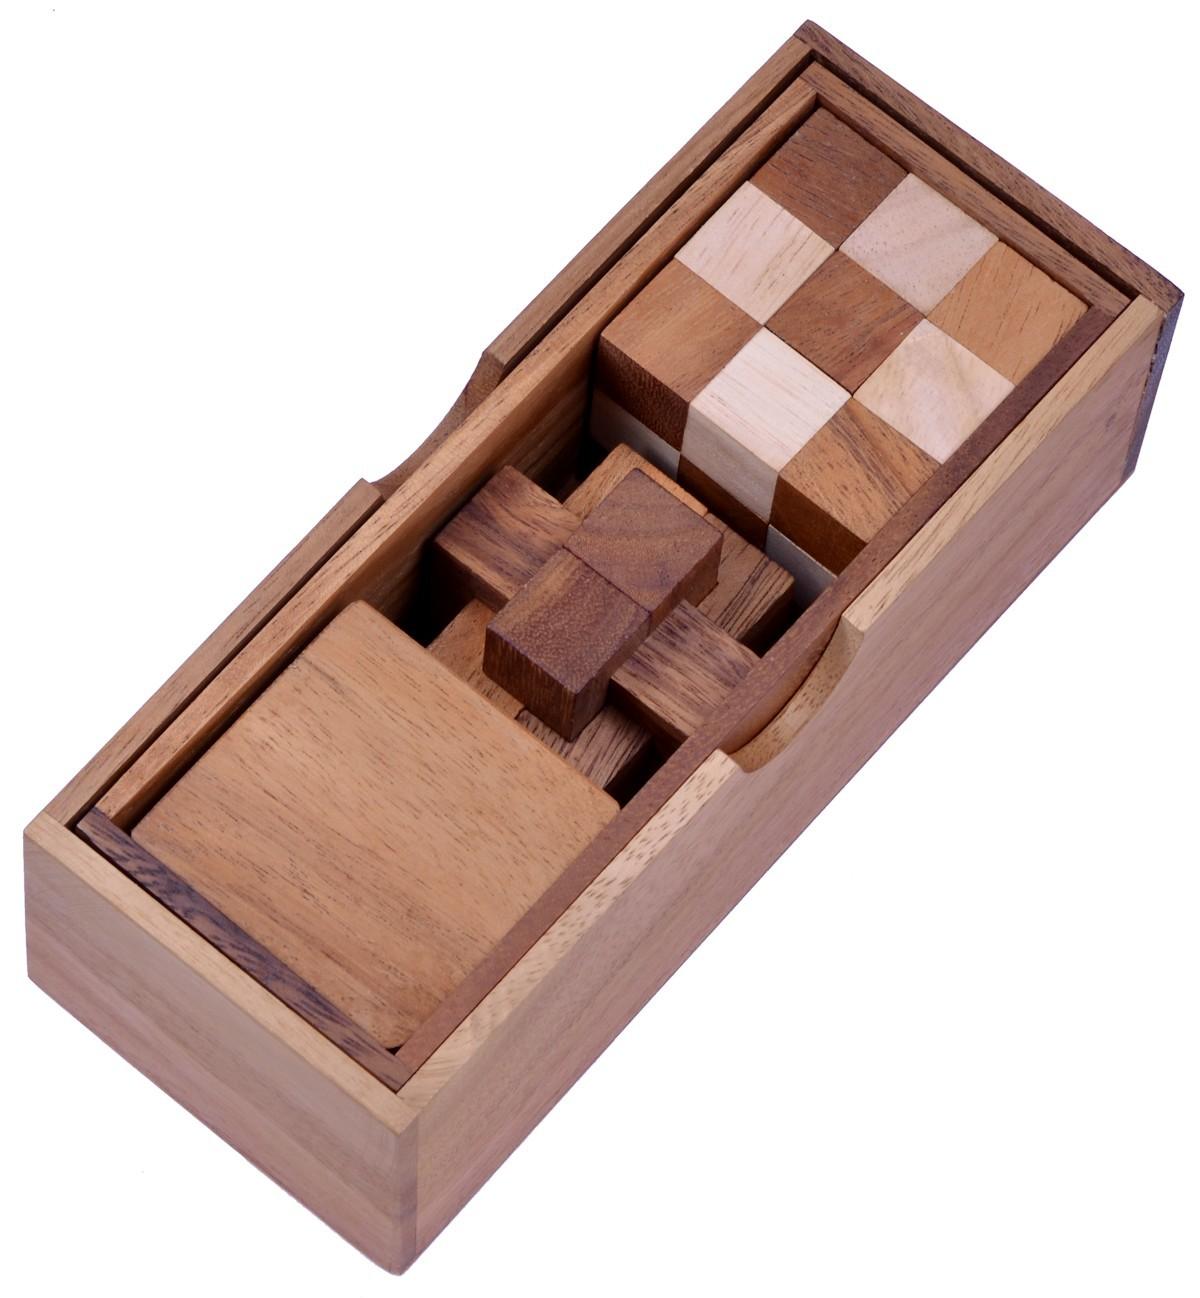 holzbox mit deckel cheap bgs bauernkasse gro mit schloss schatzkiste truhe schatztruhe holzbox. Black Bedroom Furniture Sets. Home Design Ideas